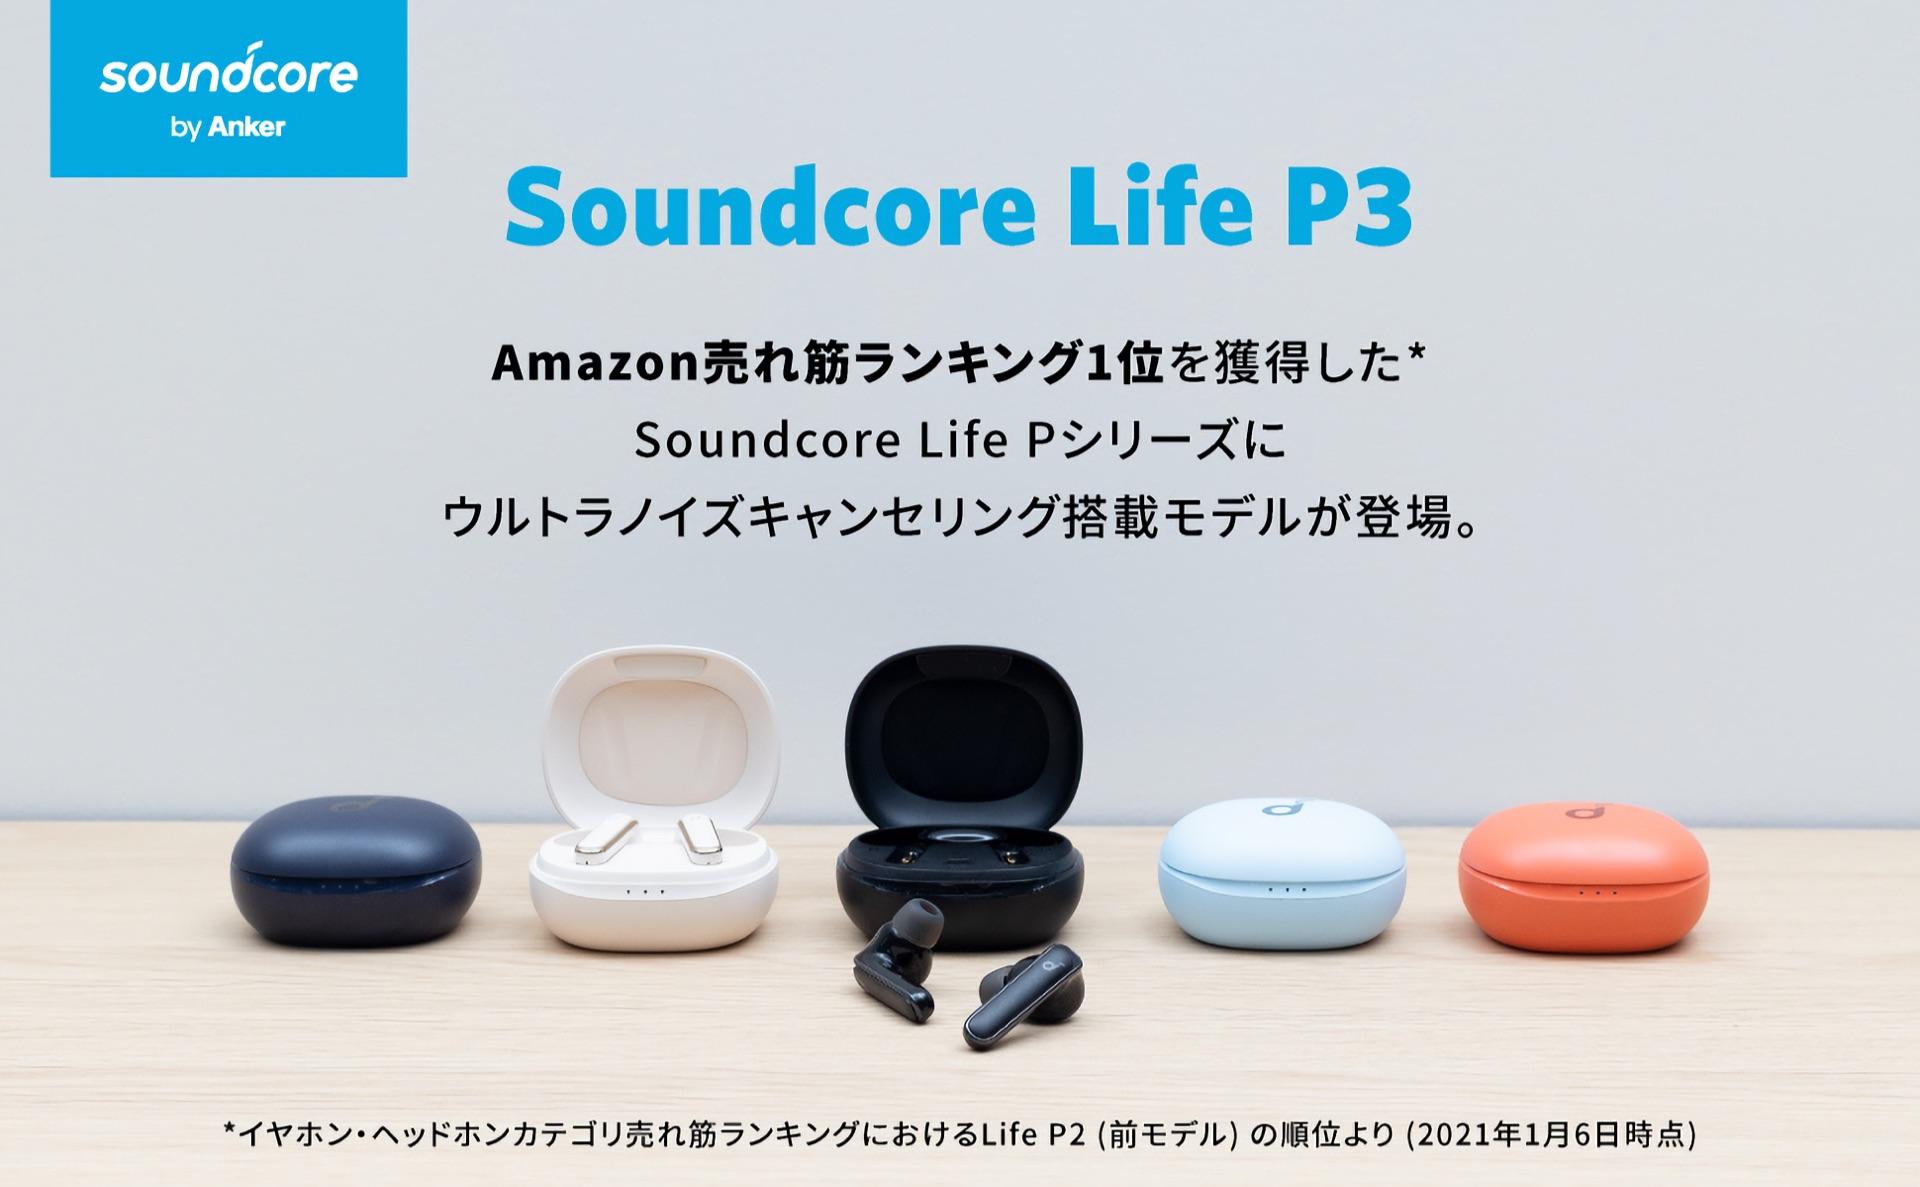 Soundcore Life P3 5 colors